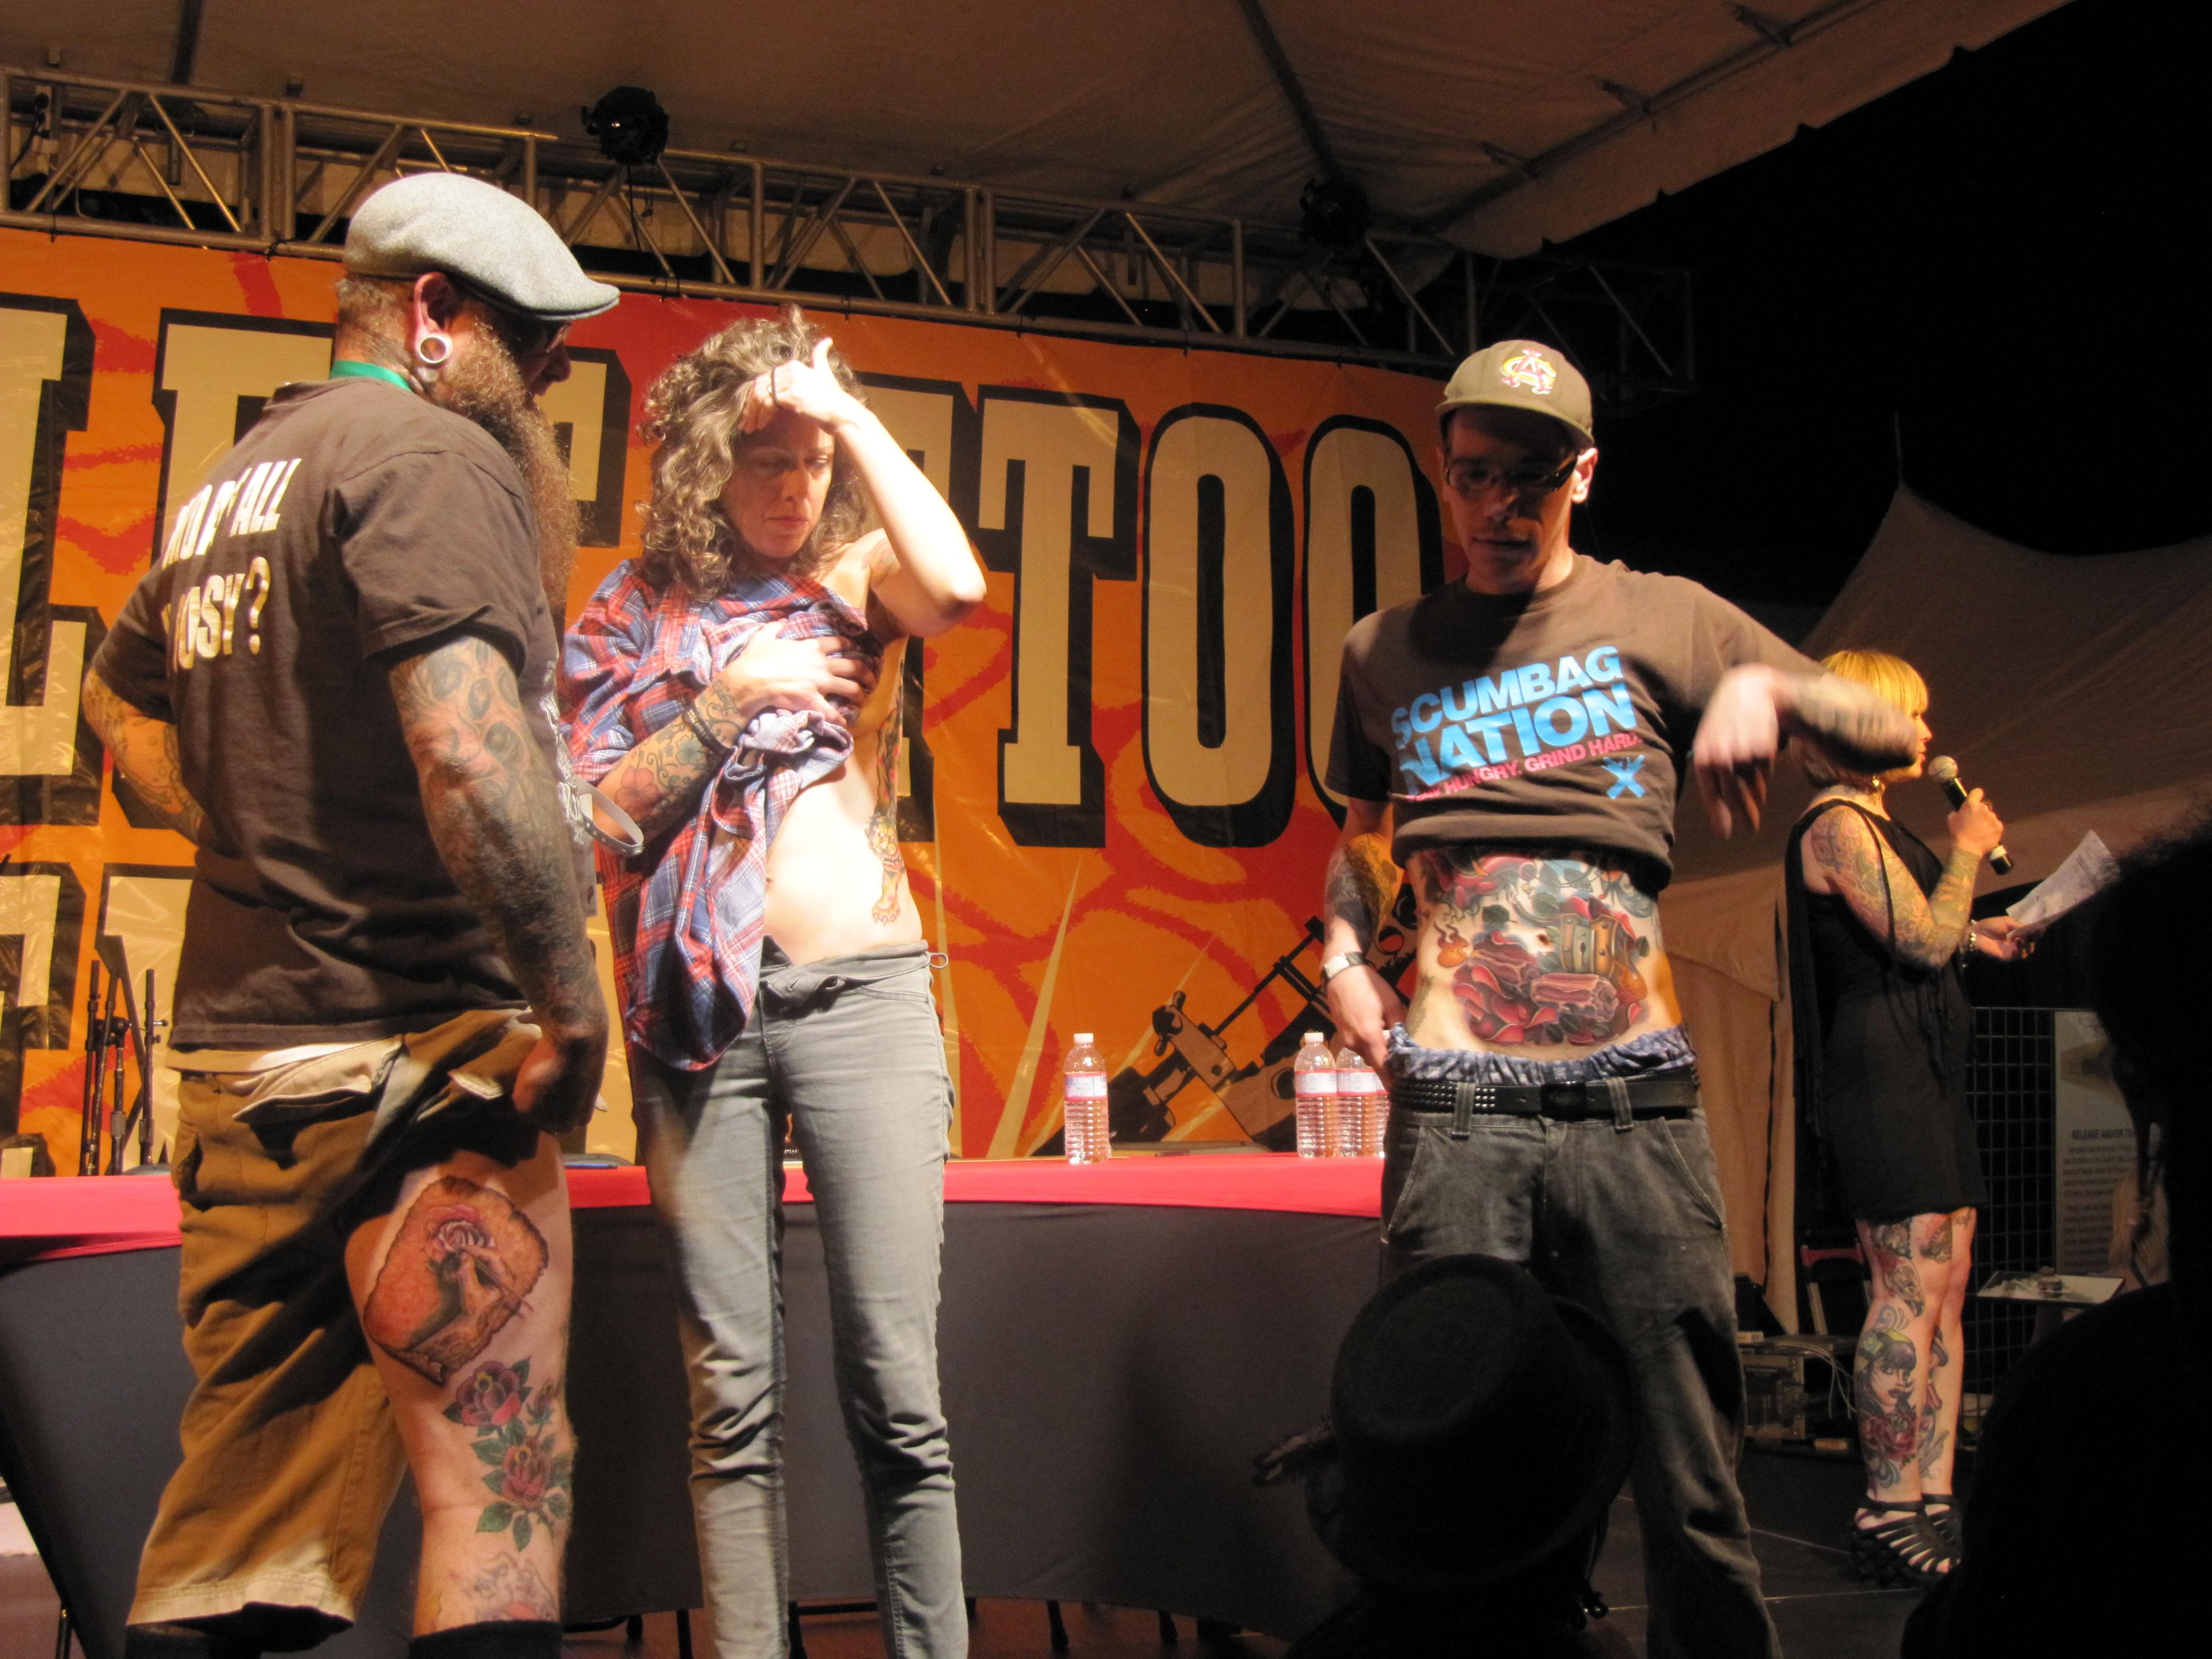 Seattle Tattoo Expo Best Tattoo Contest winners | Streetzblog.com